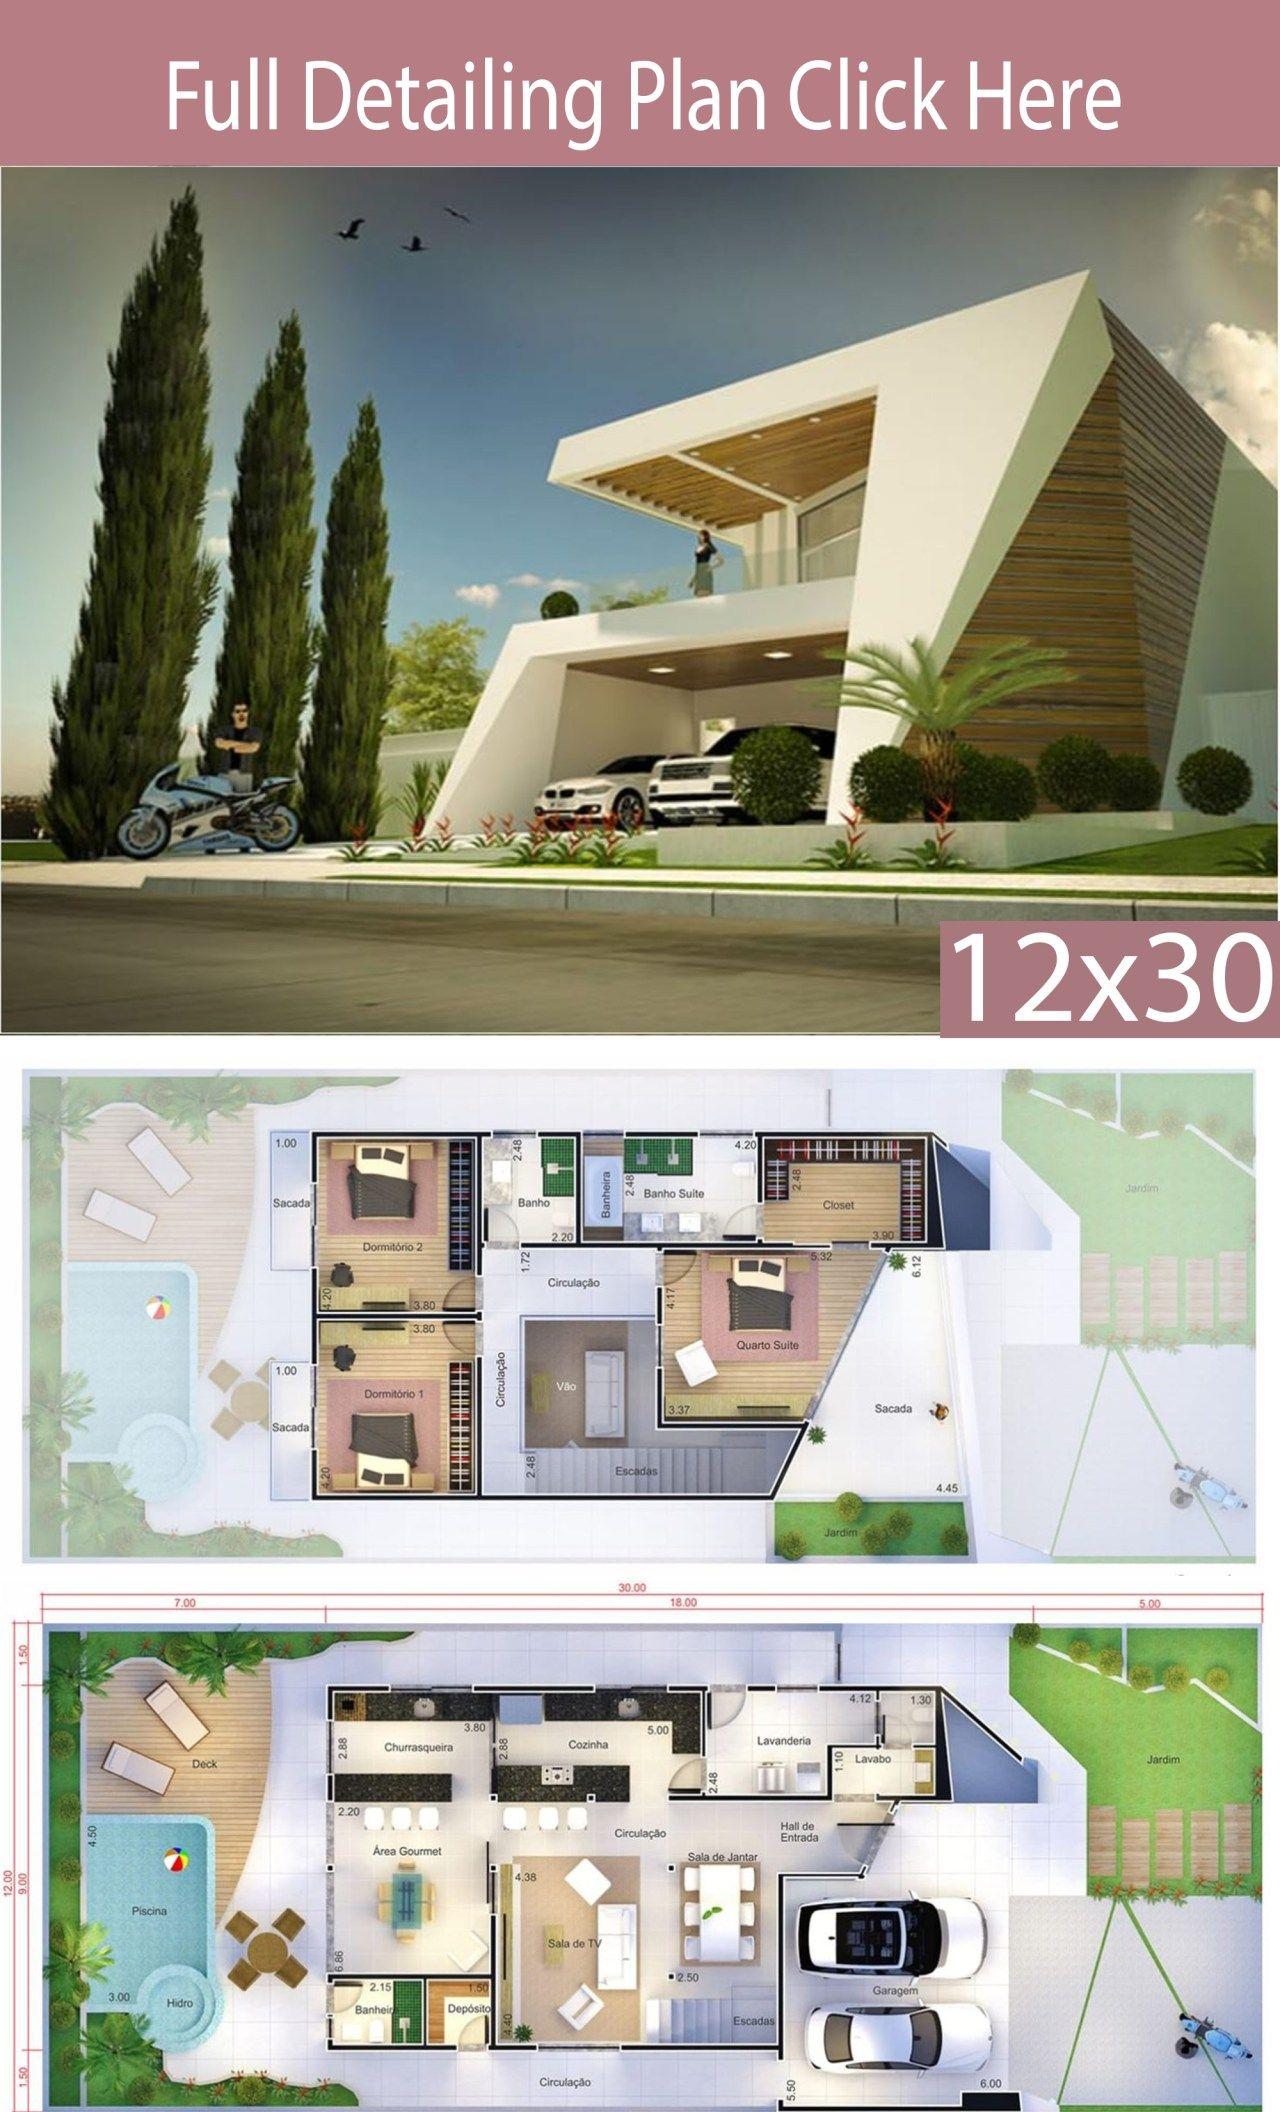 Modern Home Design 12x30 Meters 3 Bedrooms Home Ideas Modern House Design House Design Modern House